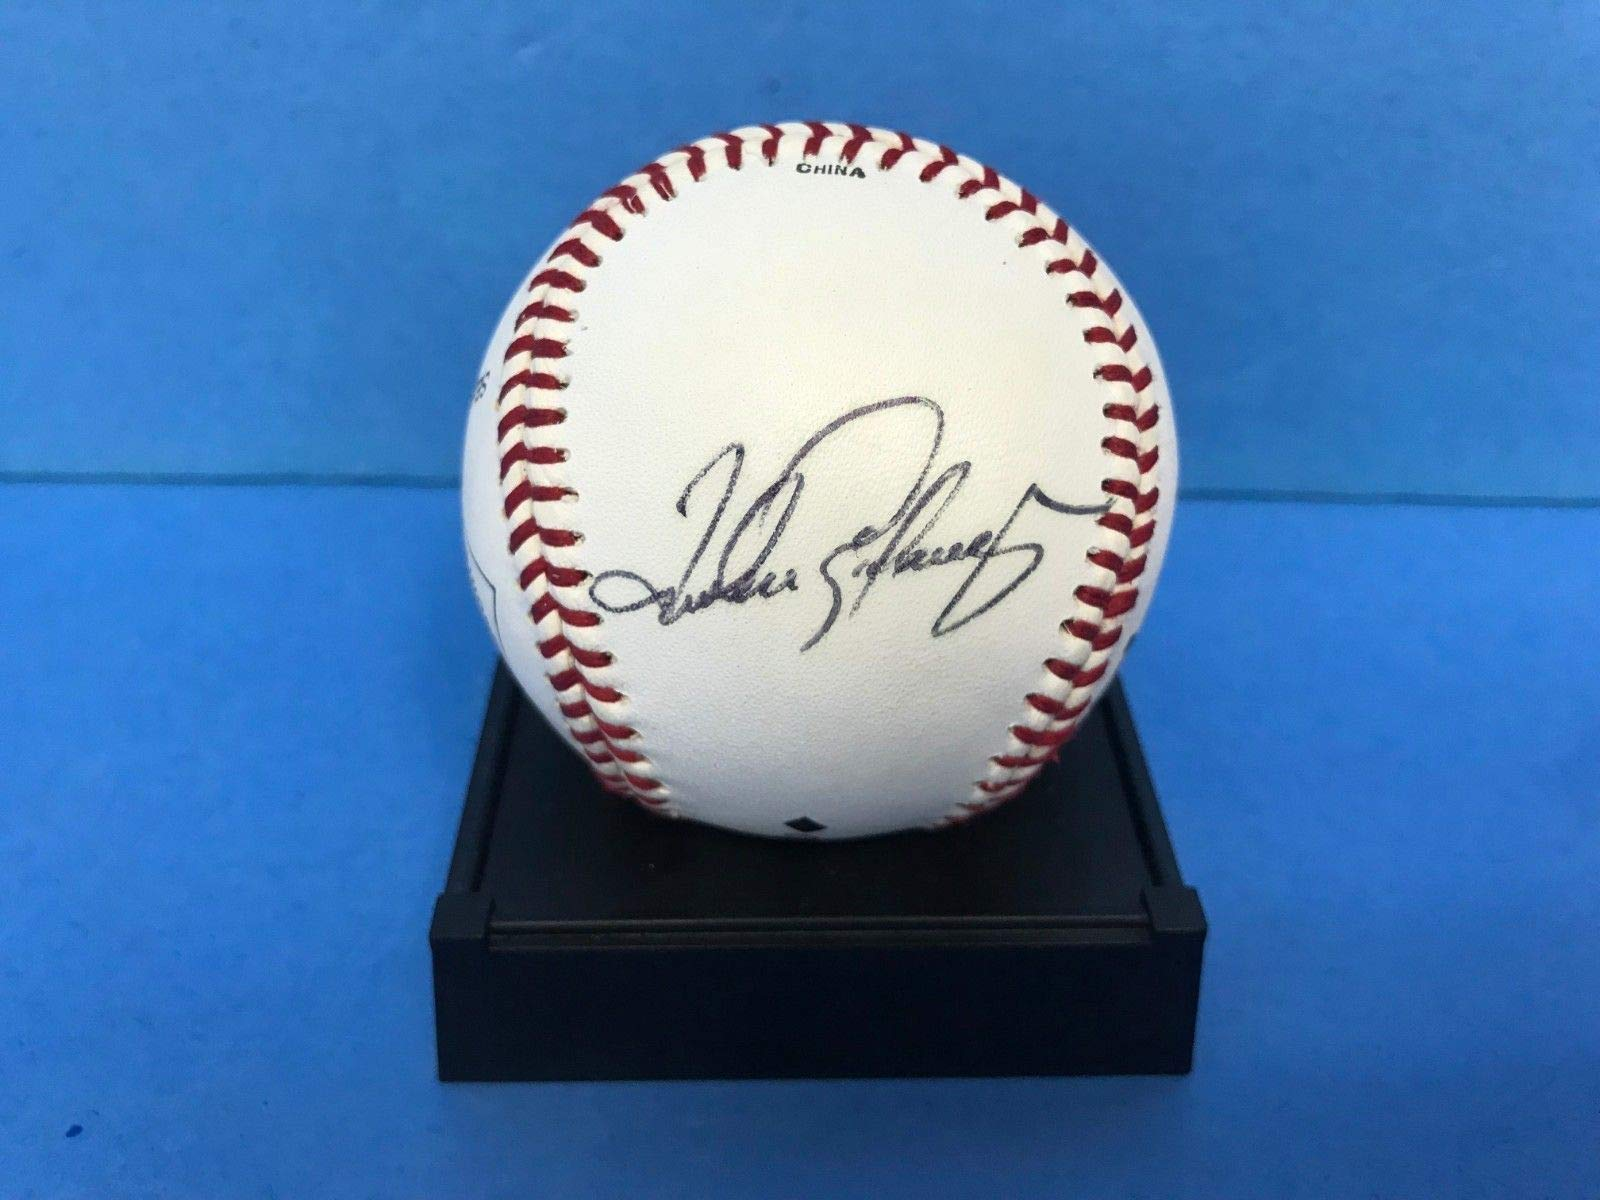 Andres Galarraga Montreal Expos Fan Favorite Signed Autograph Baseball